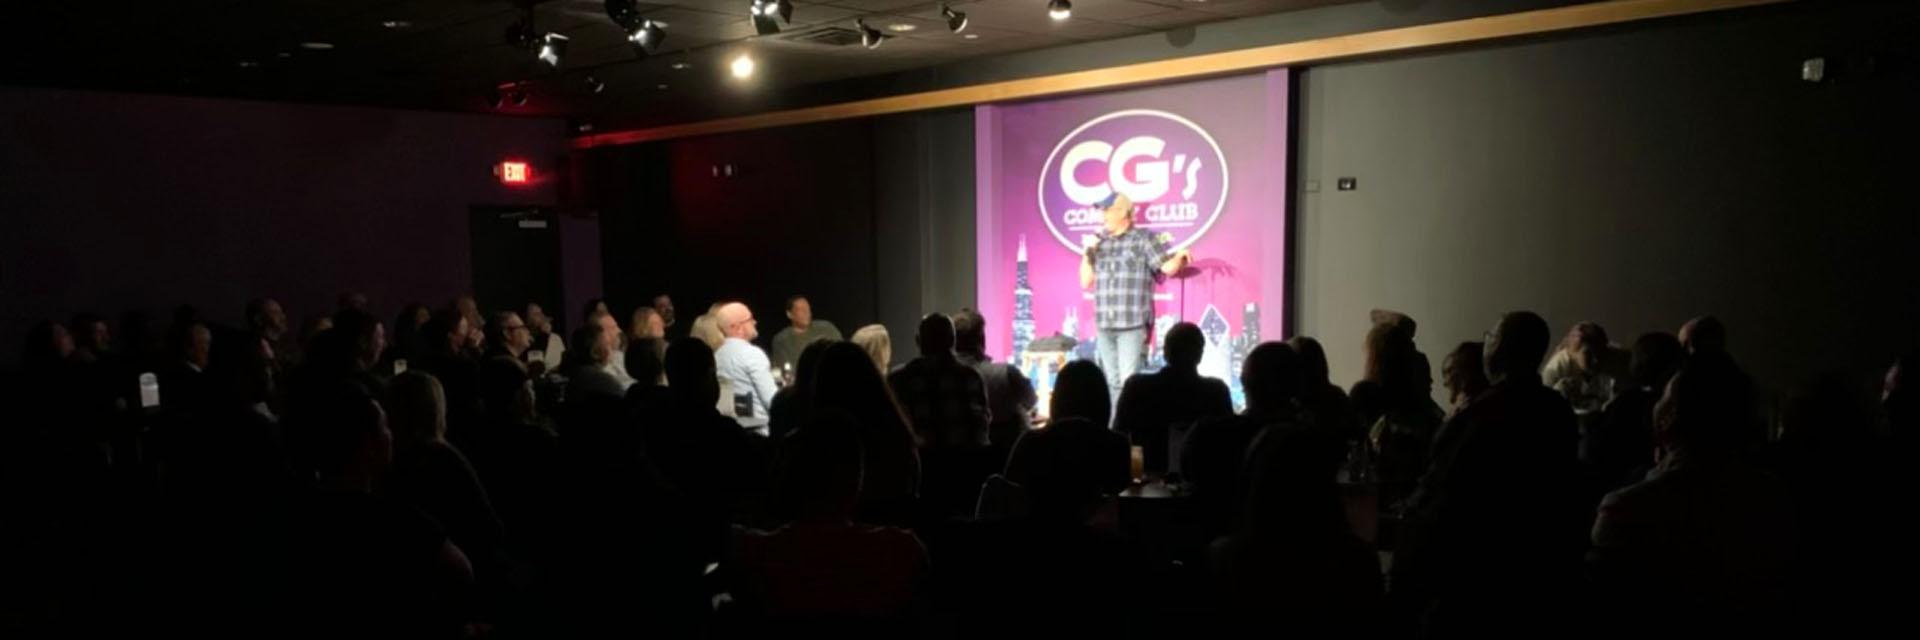 CG's Comedy Club